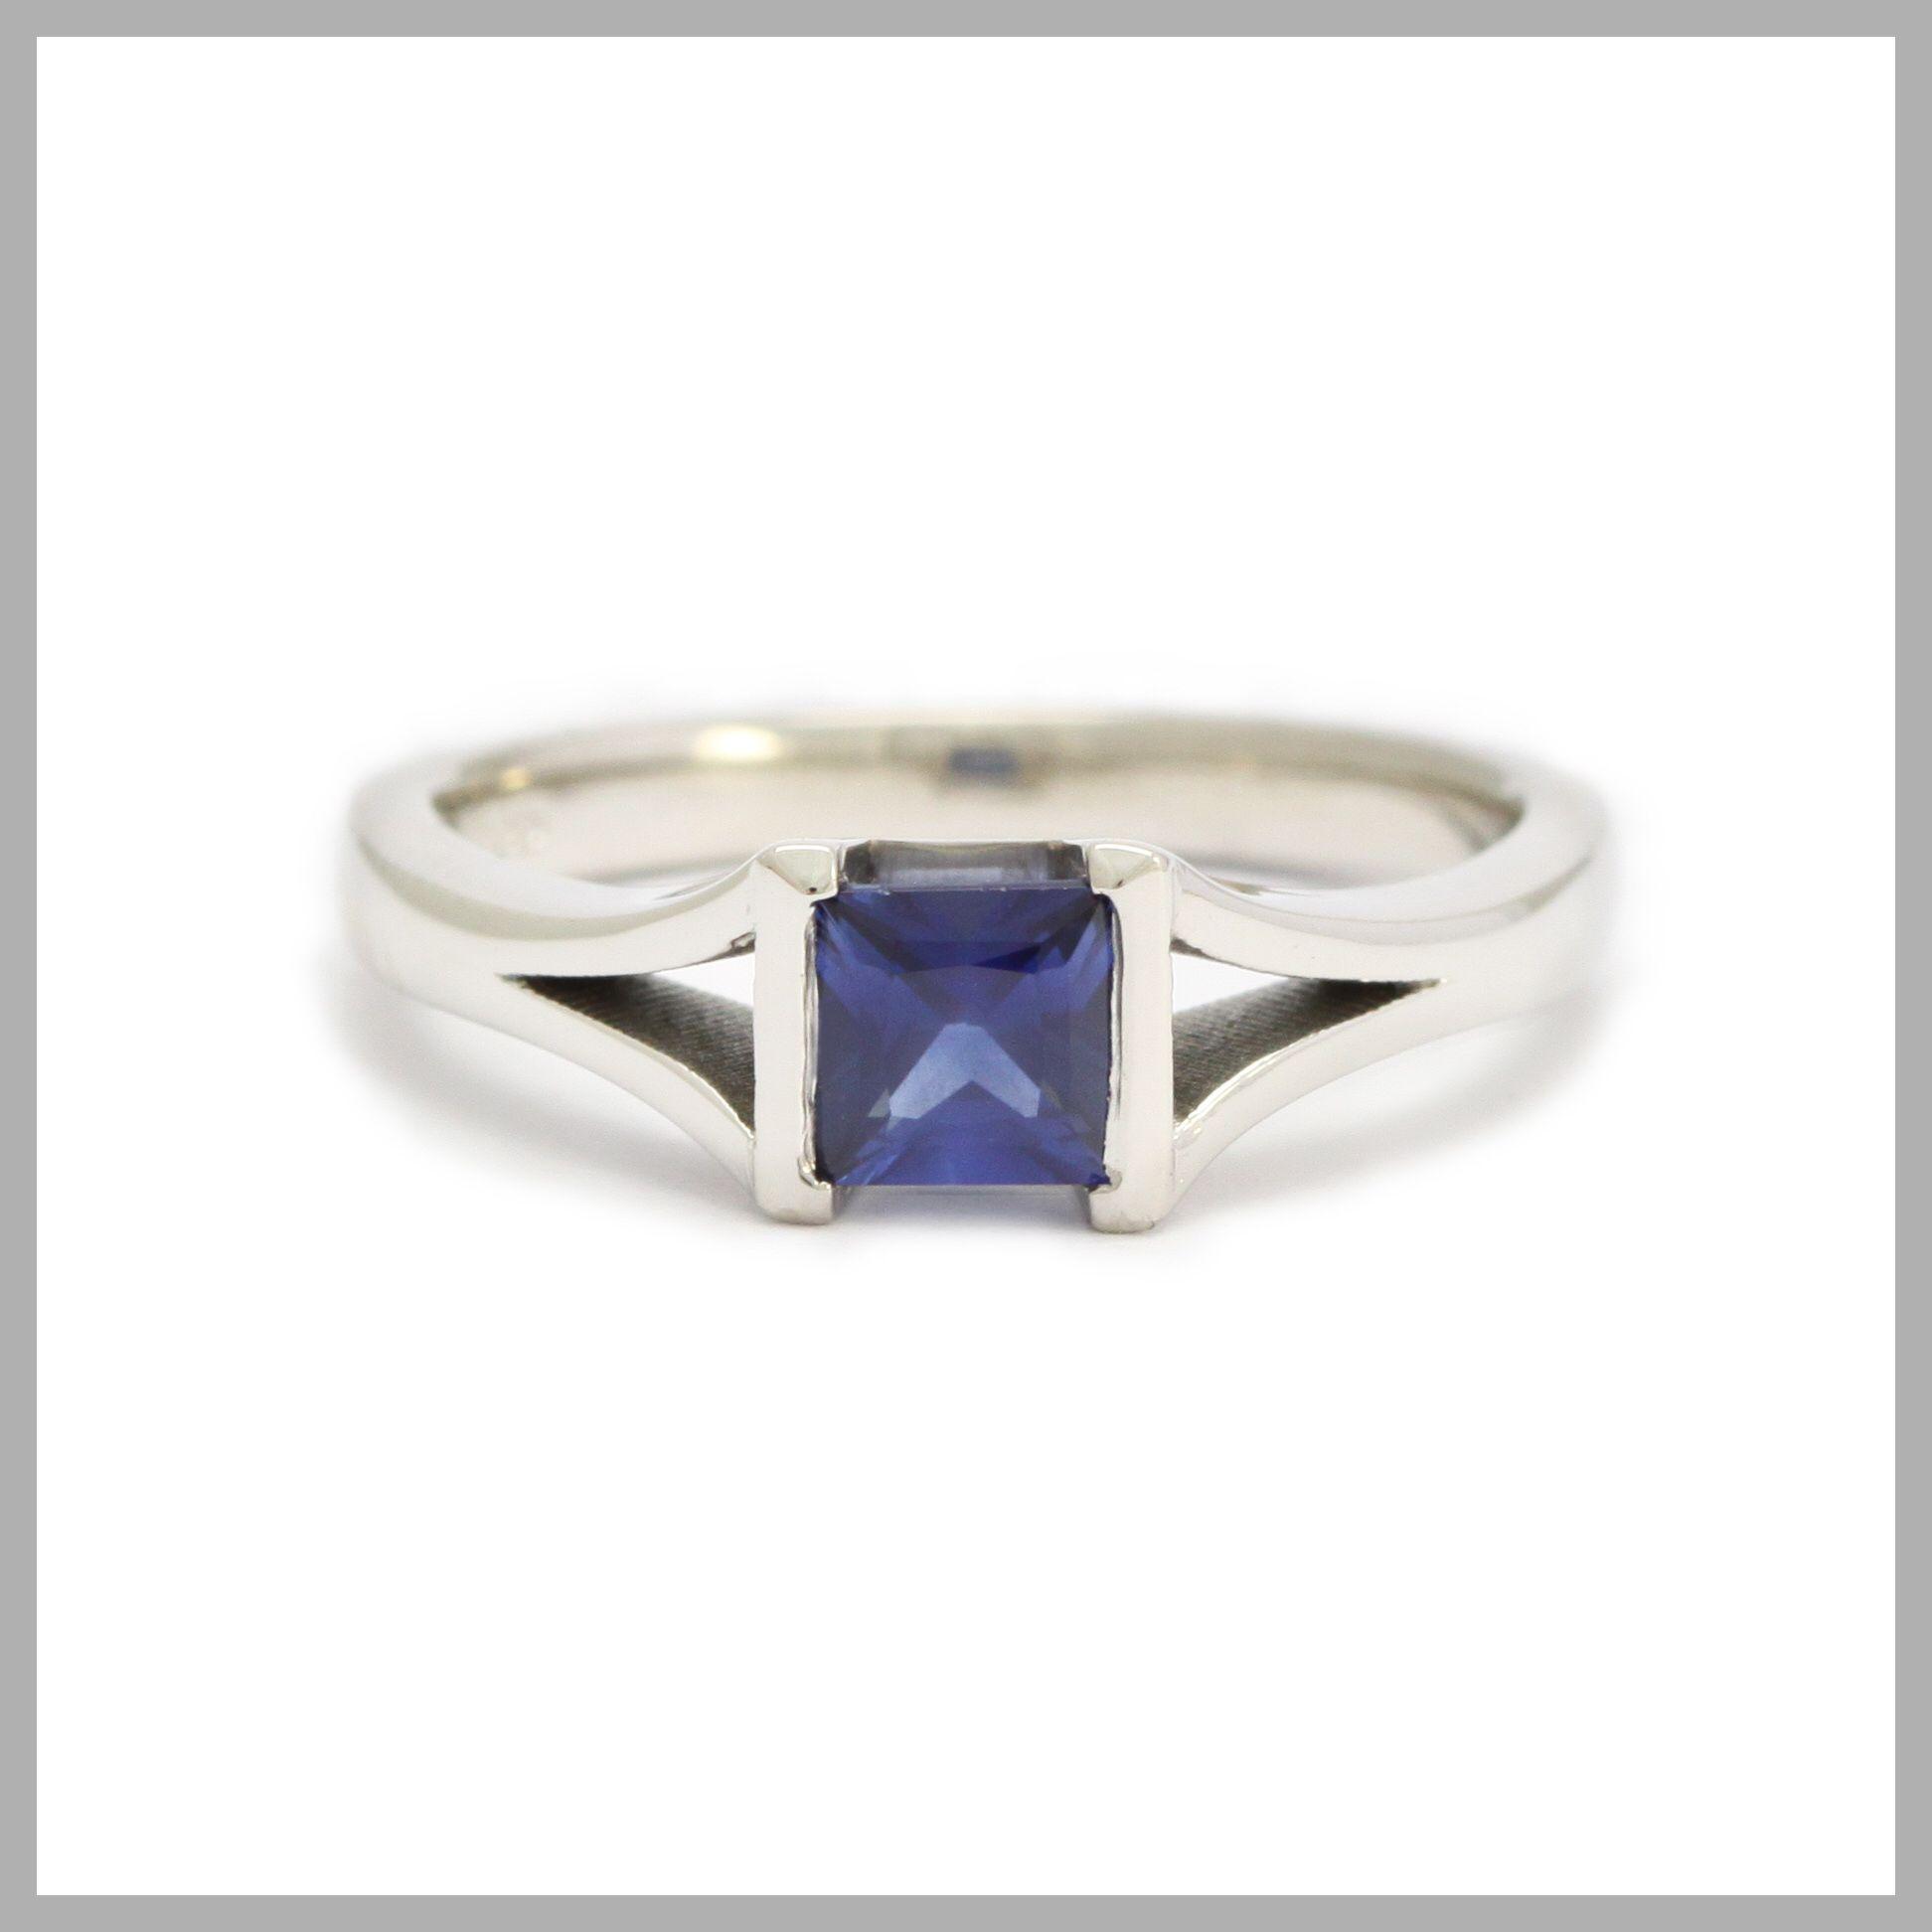 Sapphire Handmade Bespoke Statement Ring Silver Gold Platinum Palladium Contemporary Statement Ring Princess